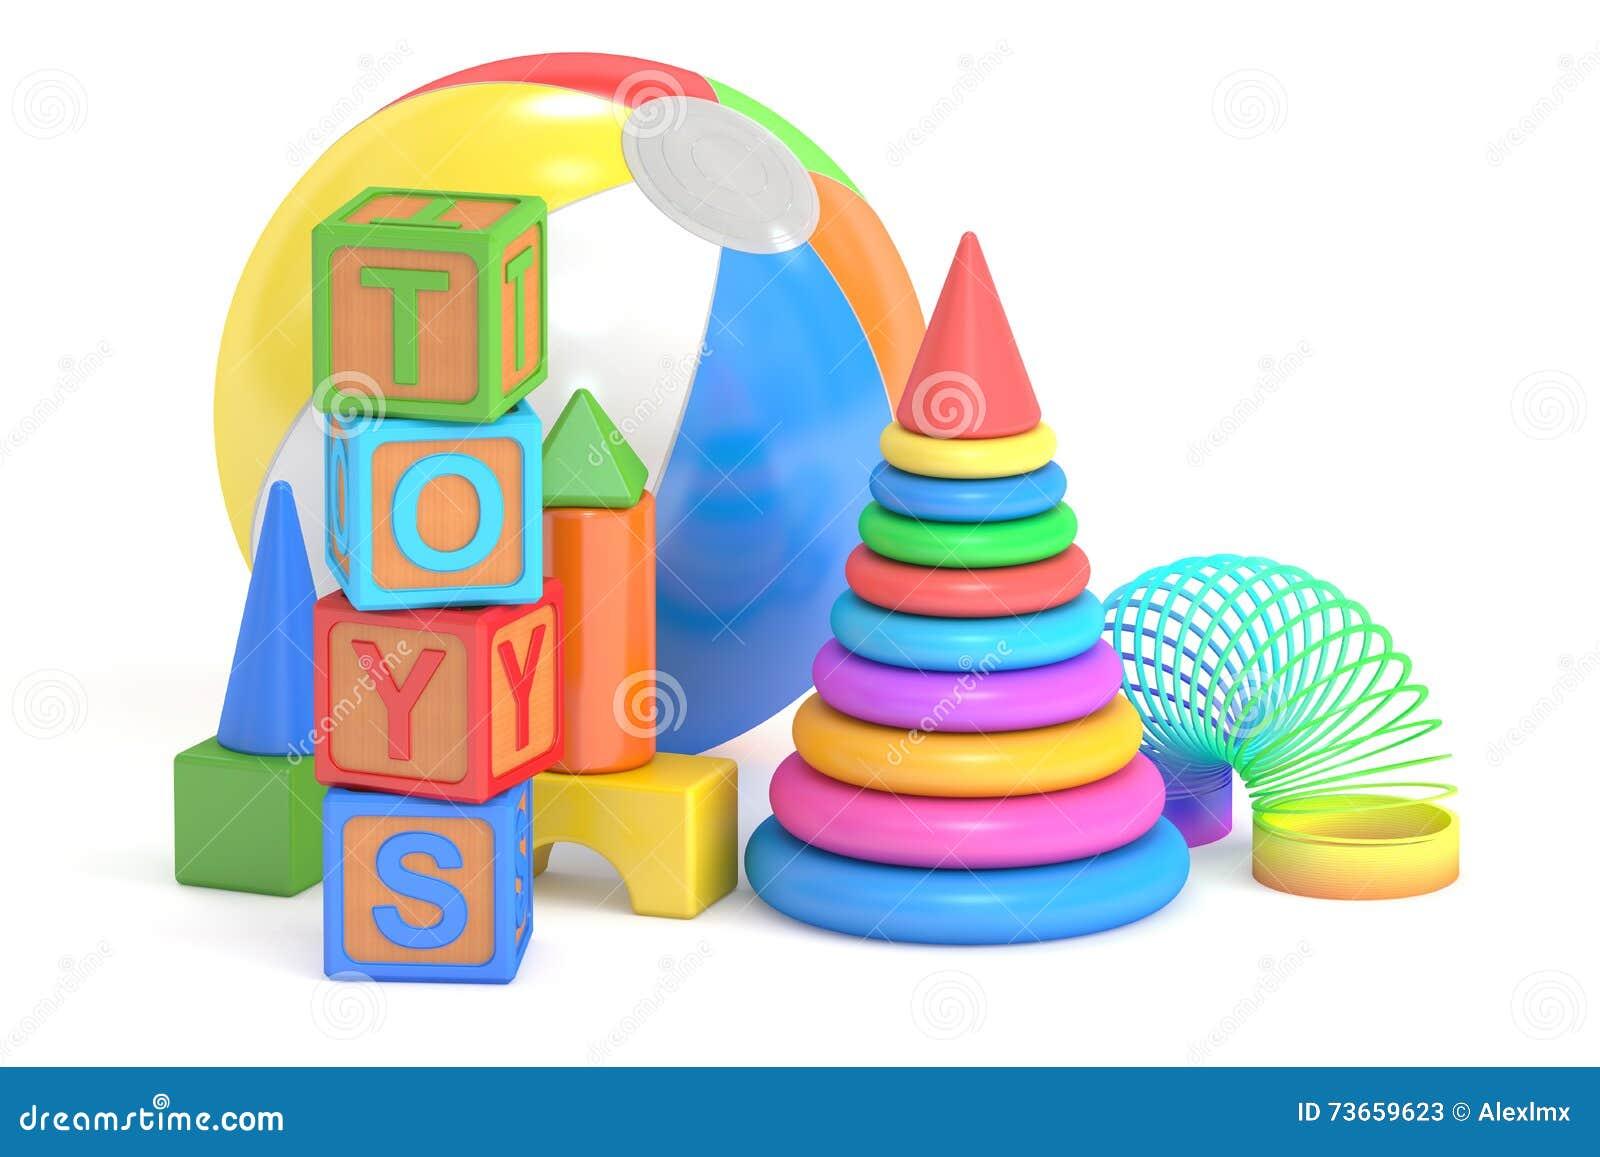 Kids toys concept, 3D rendering